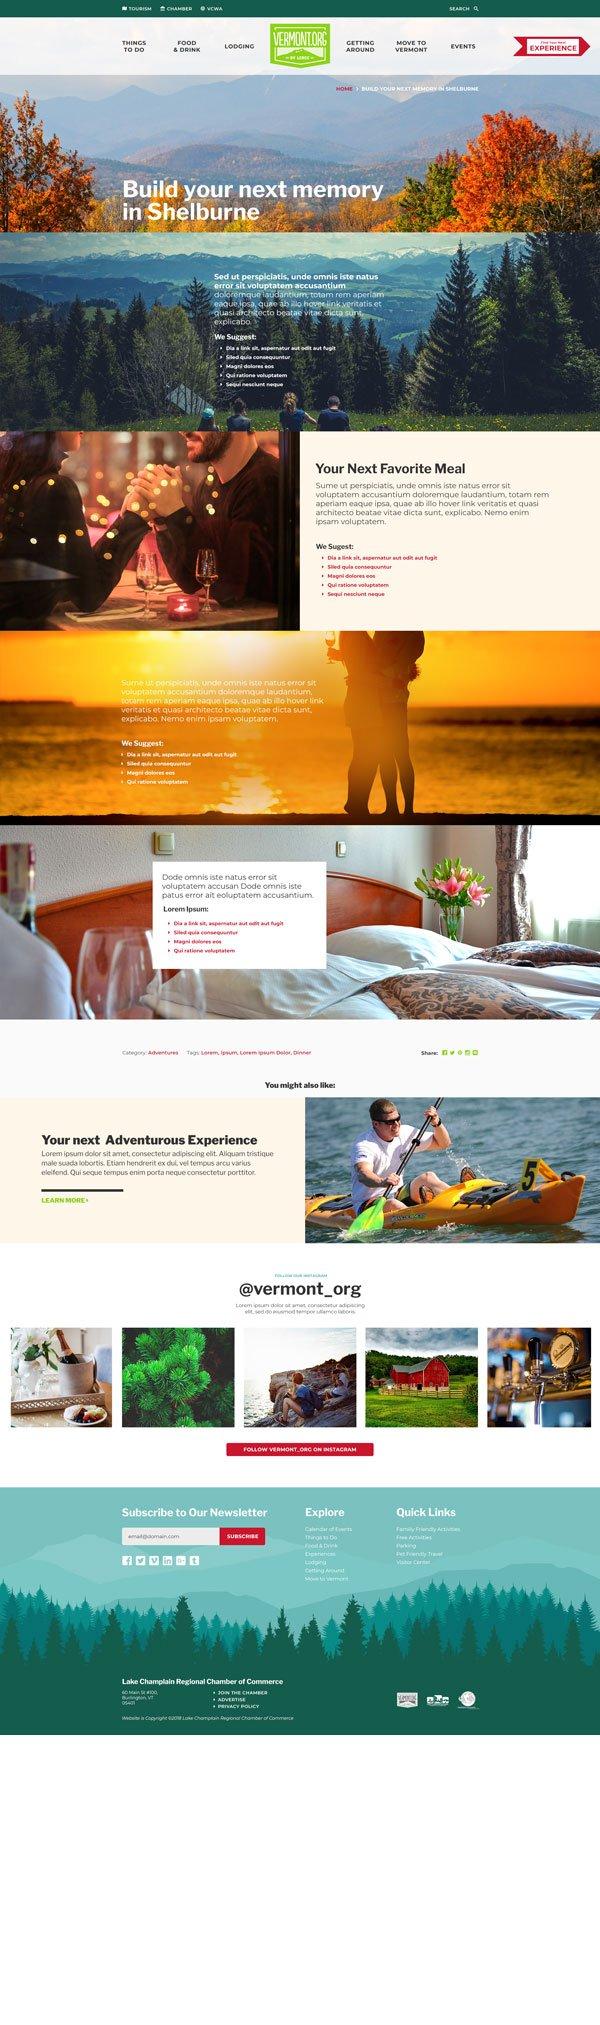 Vermont.org website image